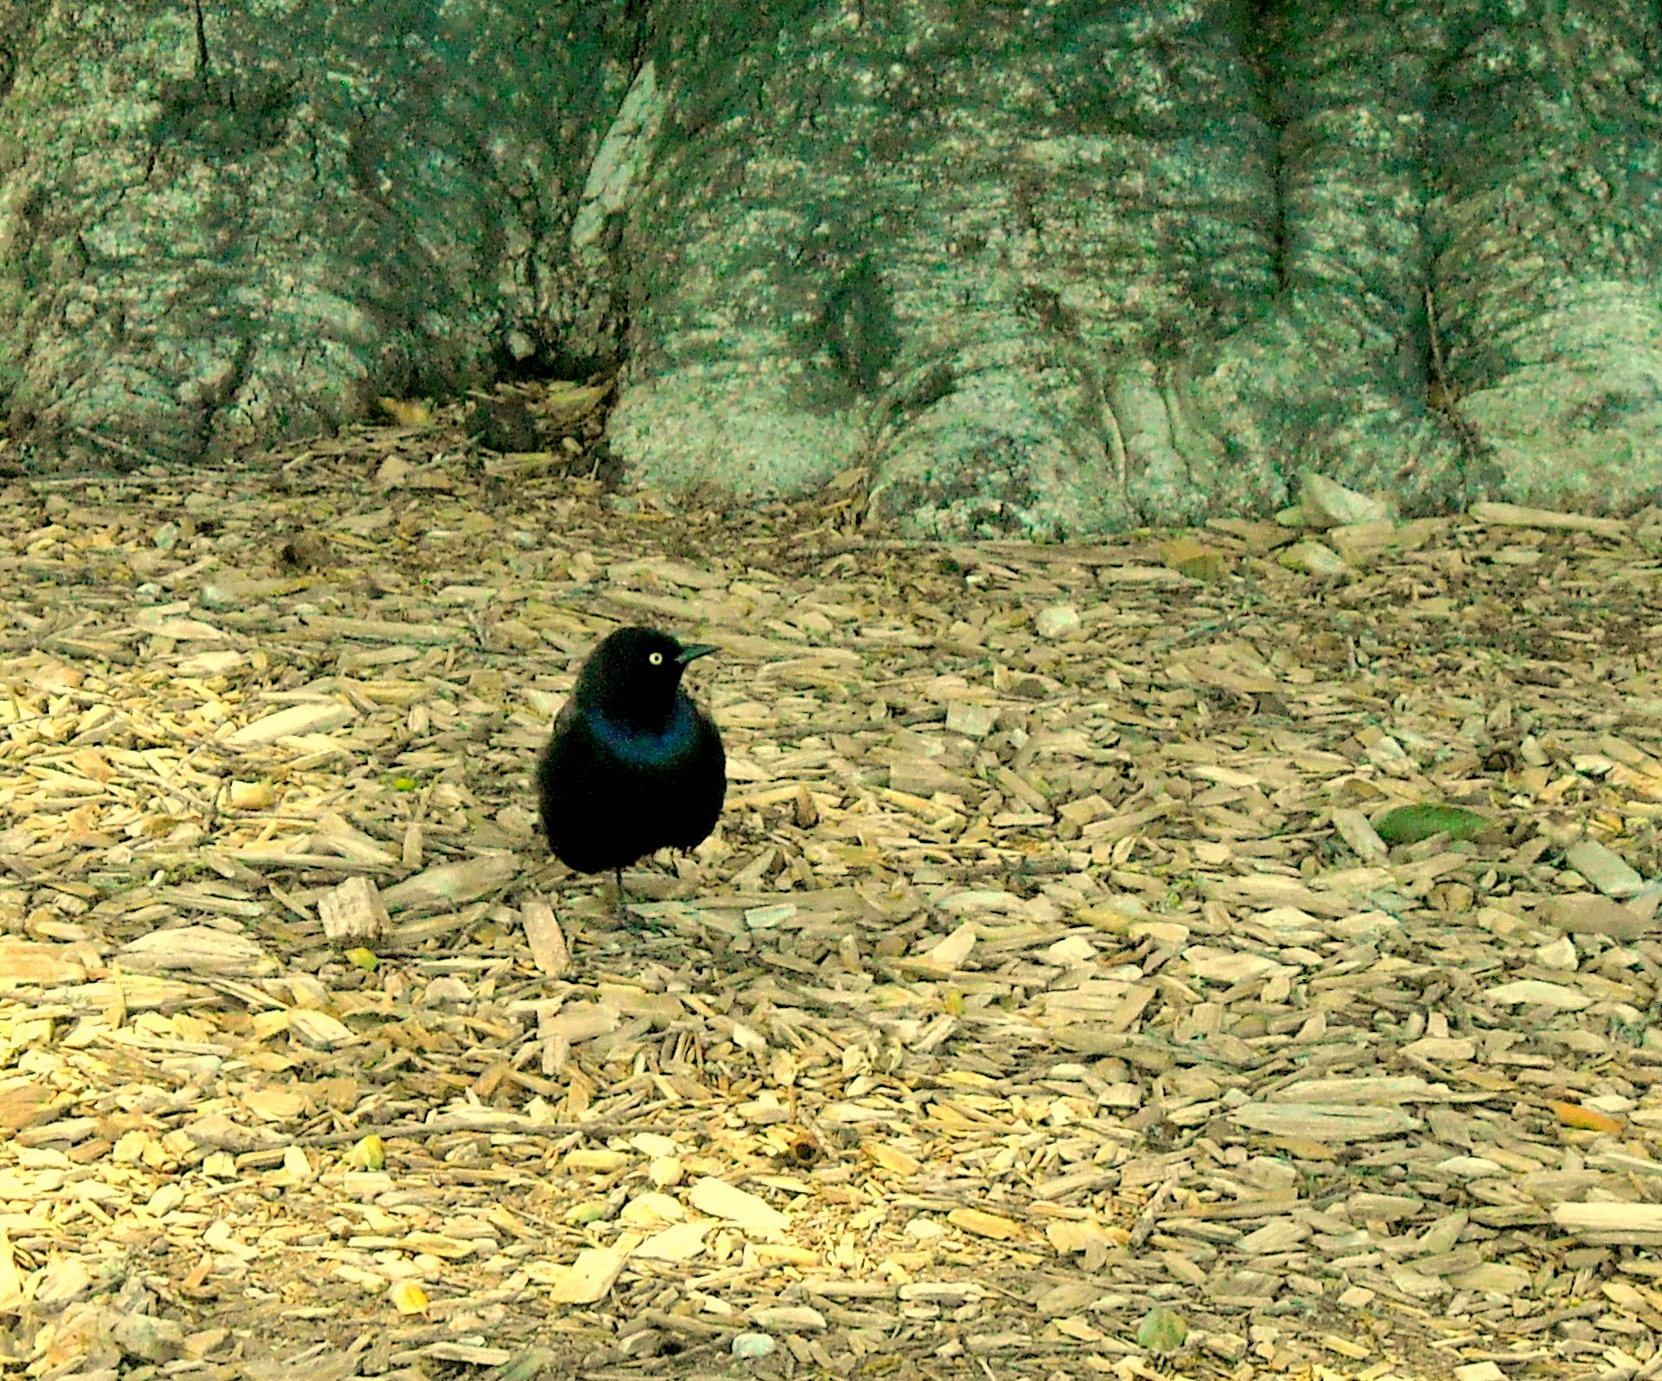 BLACK BIRD, FULL SCREEN by Akin Saner